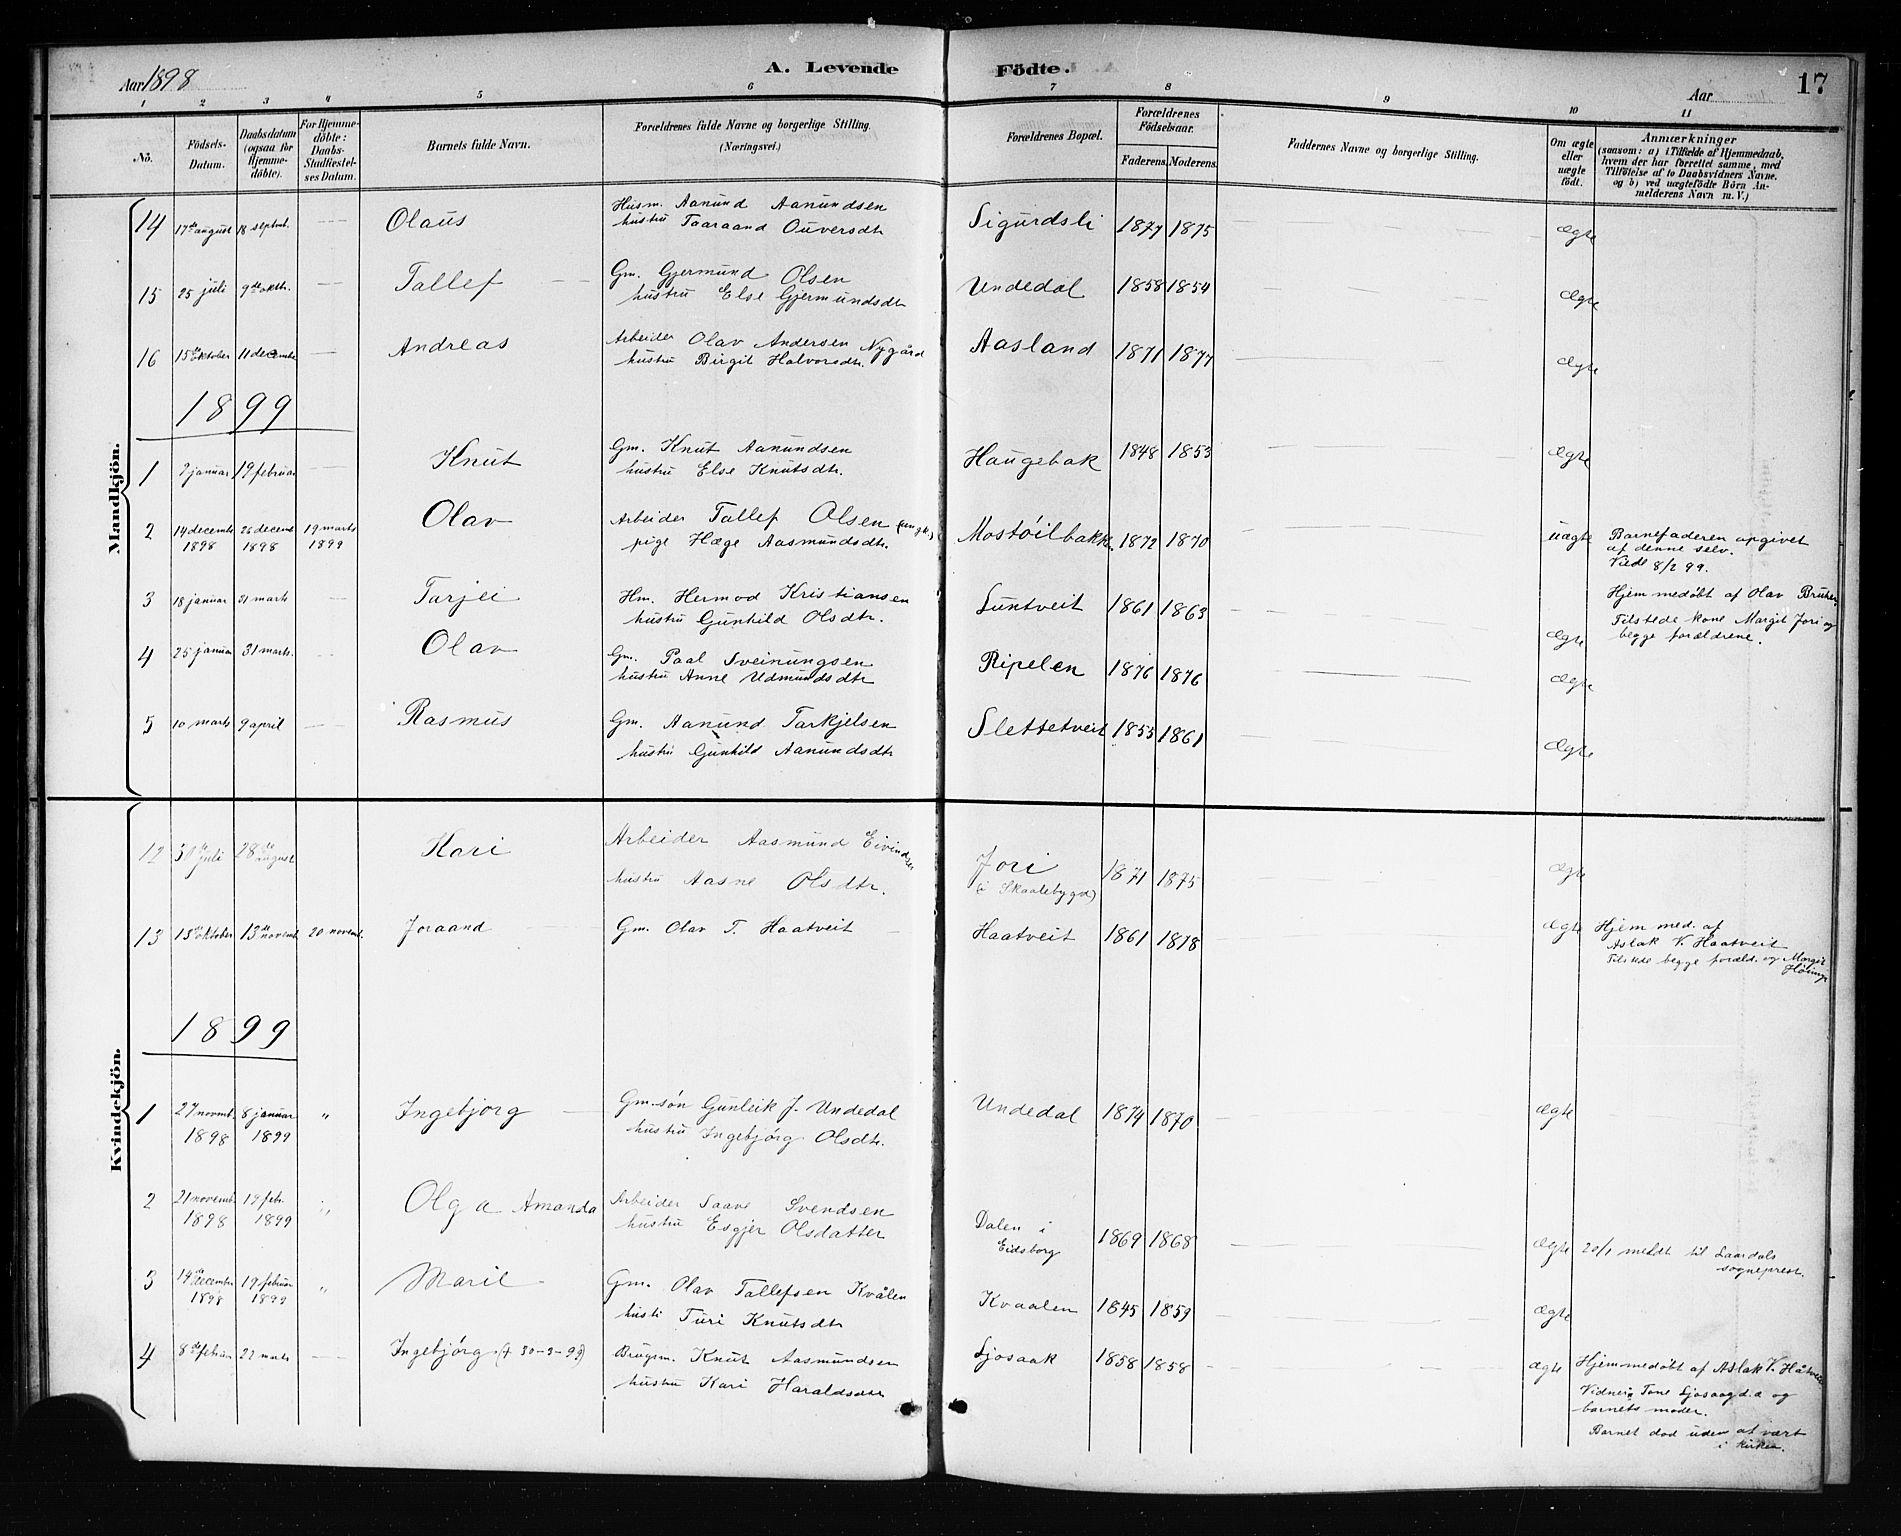 SAKO, Mo kirkebøker, G/Ga/L0002: Klokkerbok nr. I 2, 1892-1914, s. 17